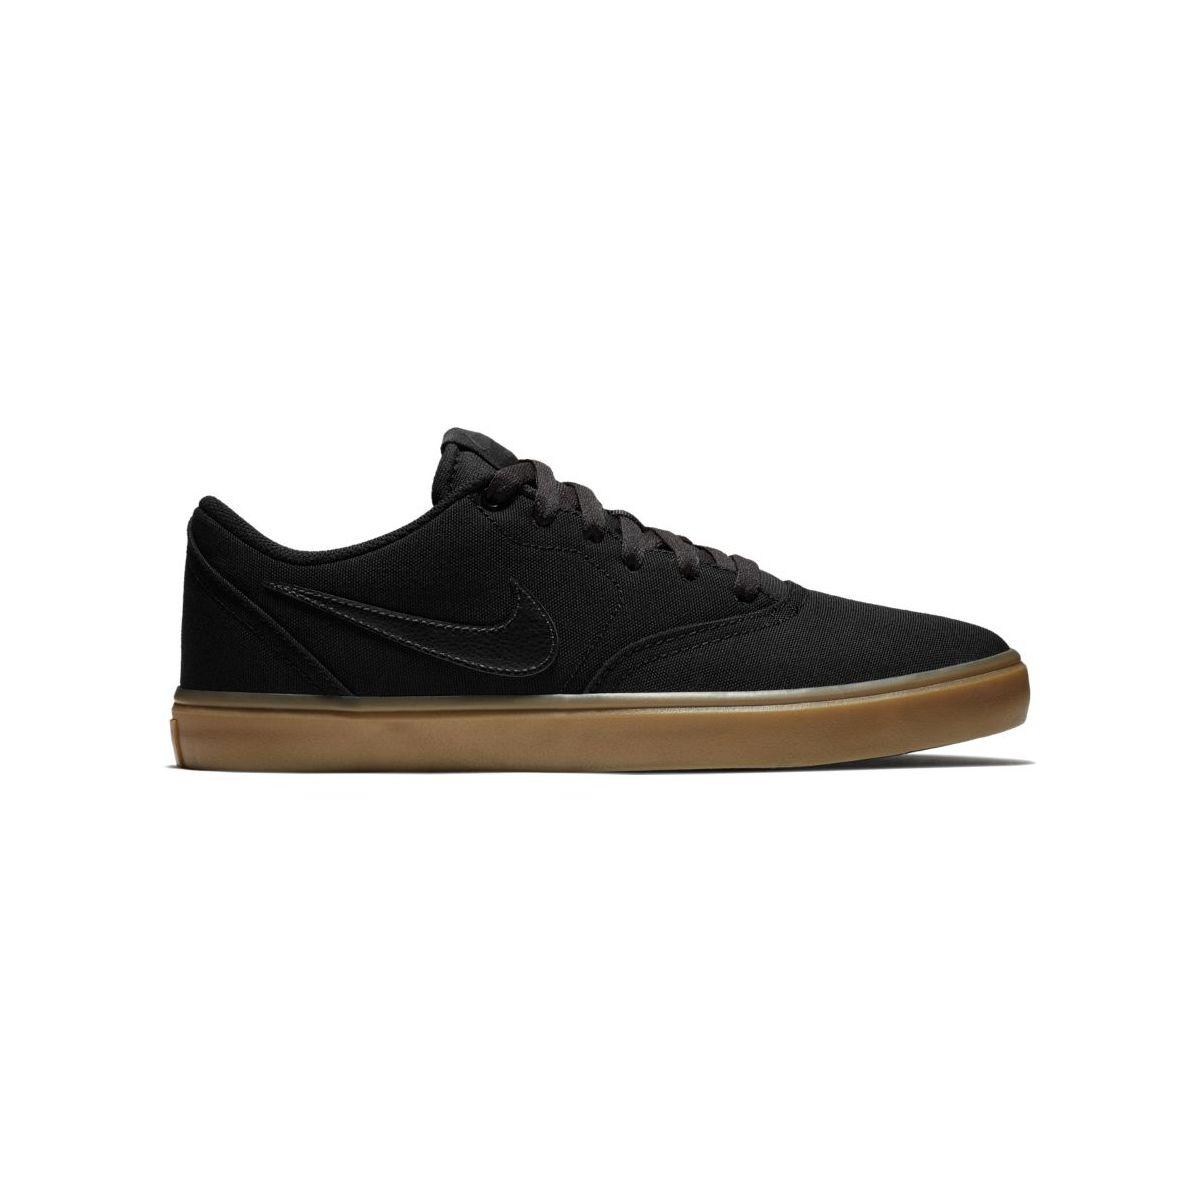 Buty Nike SB Check Solarsoft Canvas Black / Black-Gum Light Brown